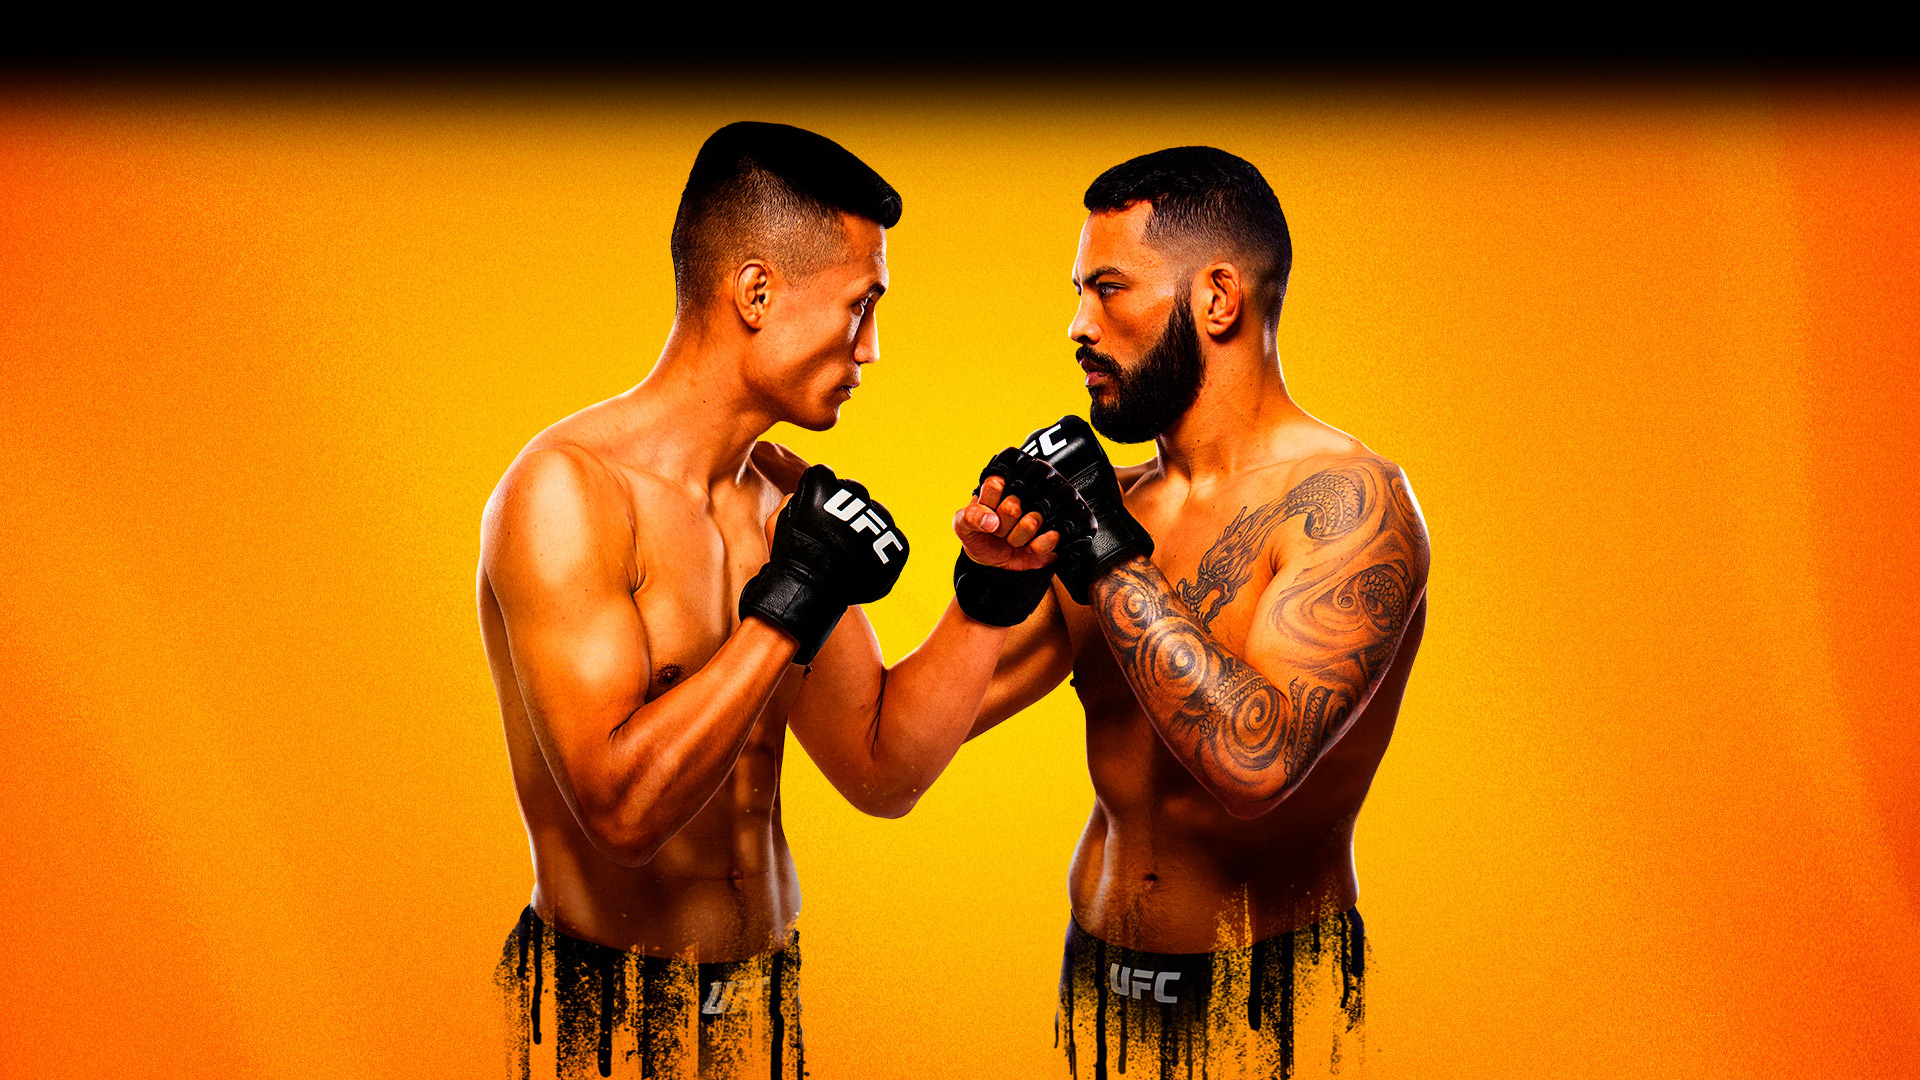 hero image for UFC Fight Night: The Korean Zombie vs Dan Ige on June 19, 2021 at the UFC APEX in Las Vegas